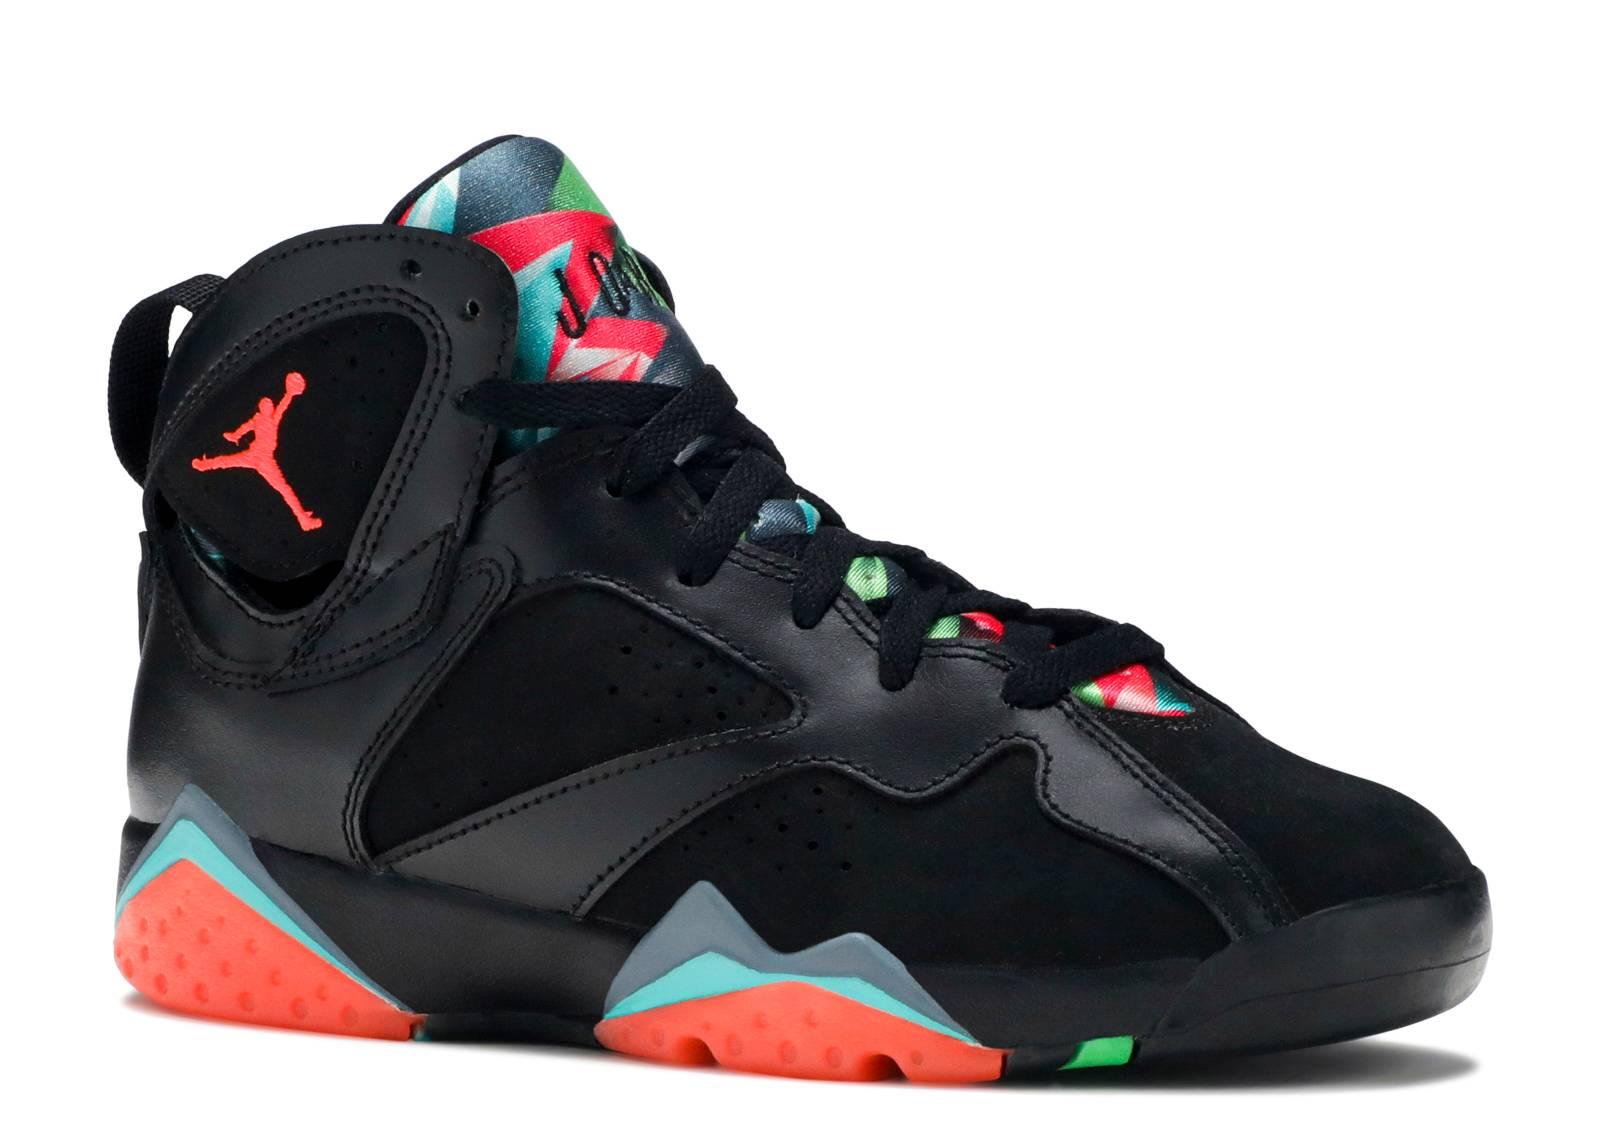 Air Jordan 7 Retro Bg 30a (gs) Barcelona Nights 7s footlocker línea barata nicekicks baratos descuento footlocker fotos falsa precio barato 94MRI42